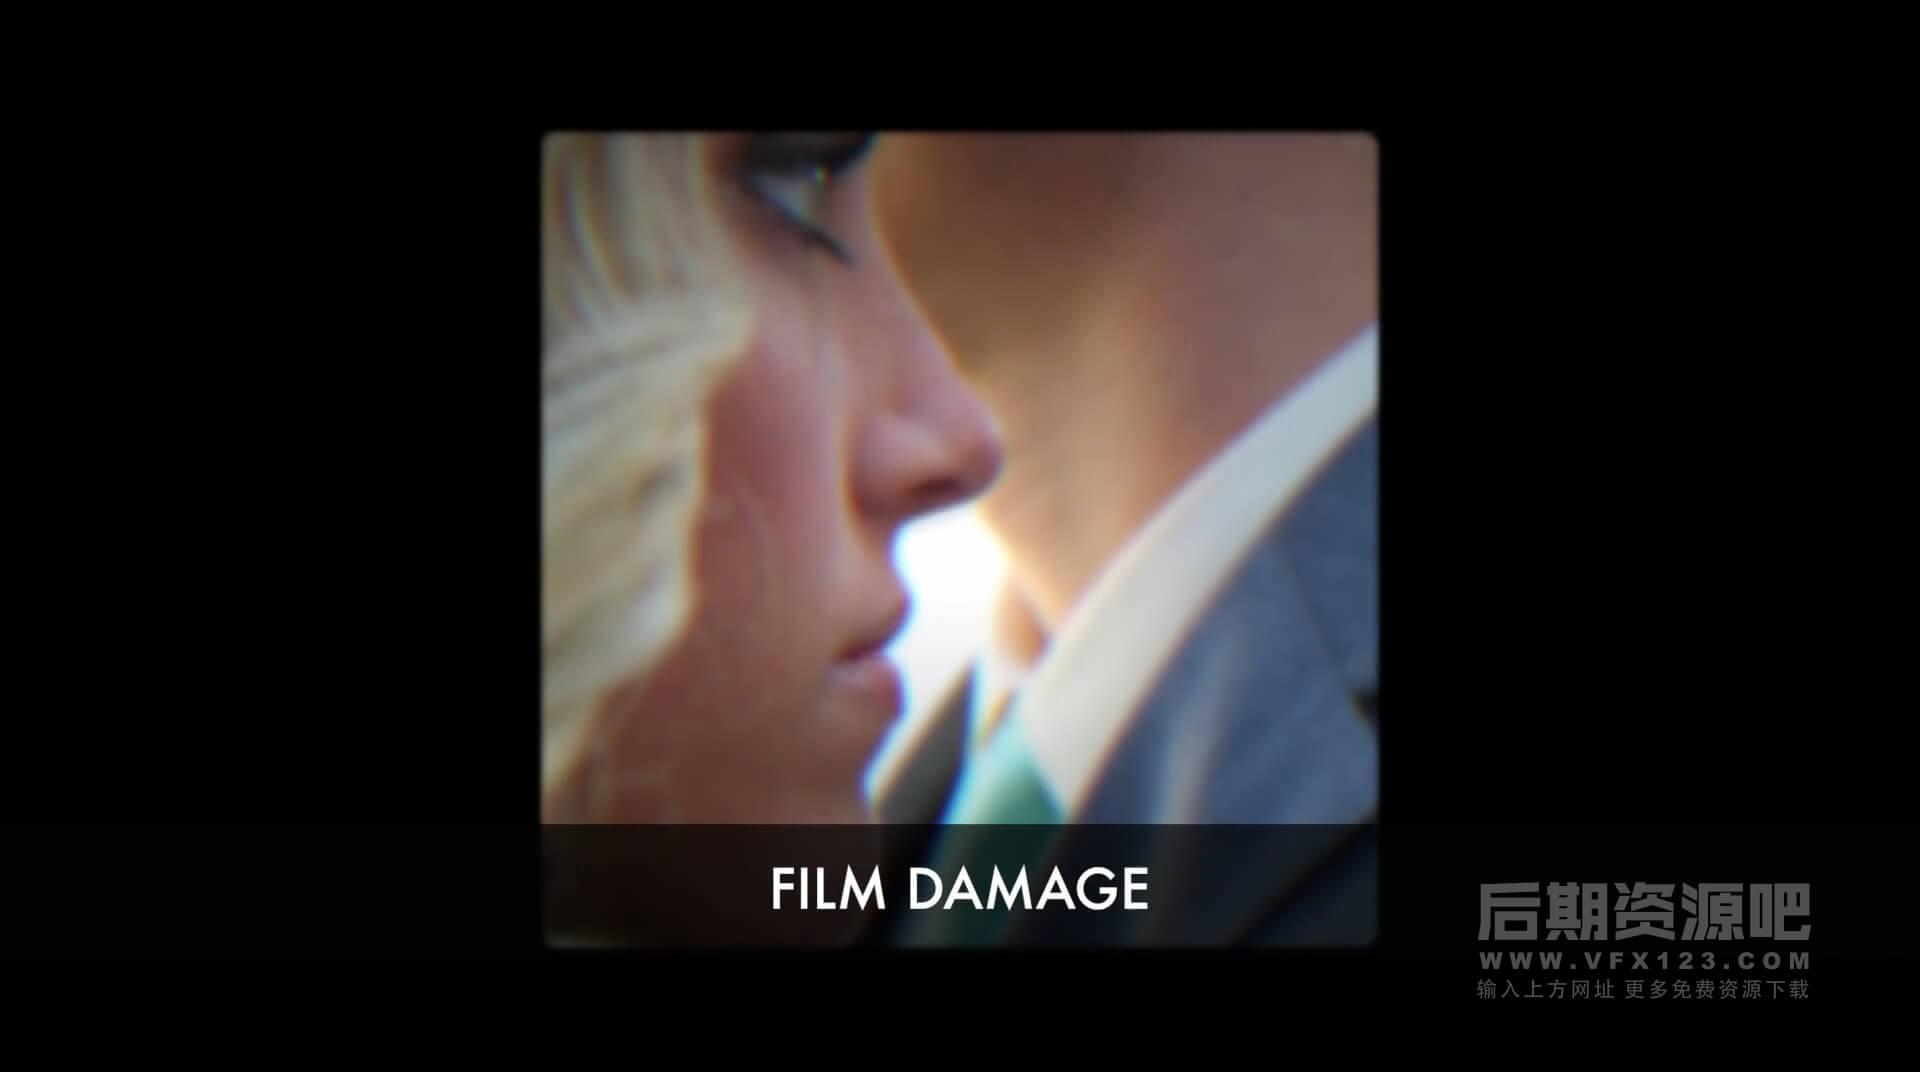 Fcpx插件 复古电影胶片幻灯机播放效果过渡转场 CineFlare Film Strip